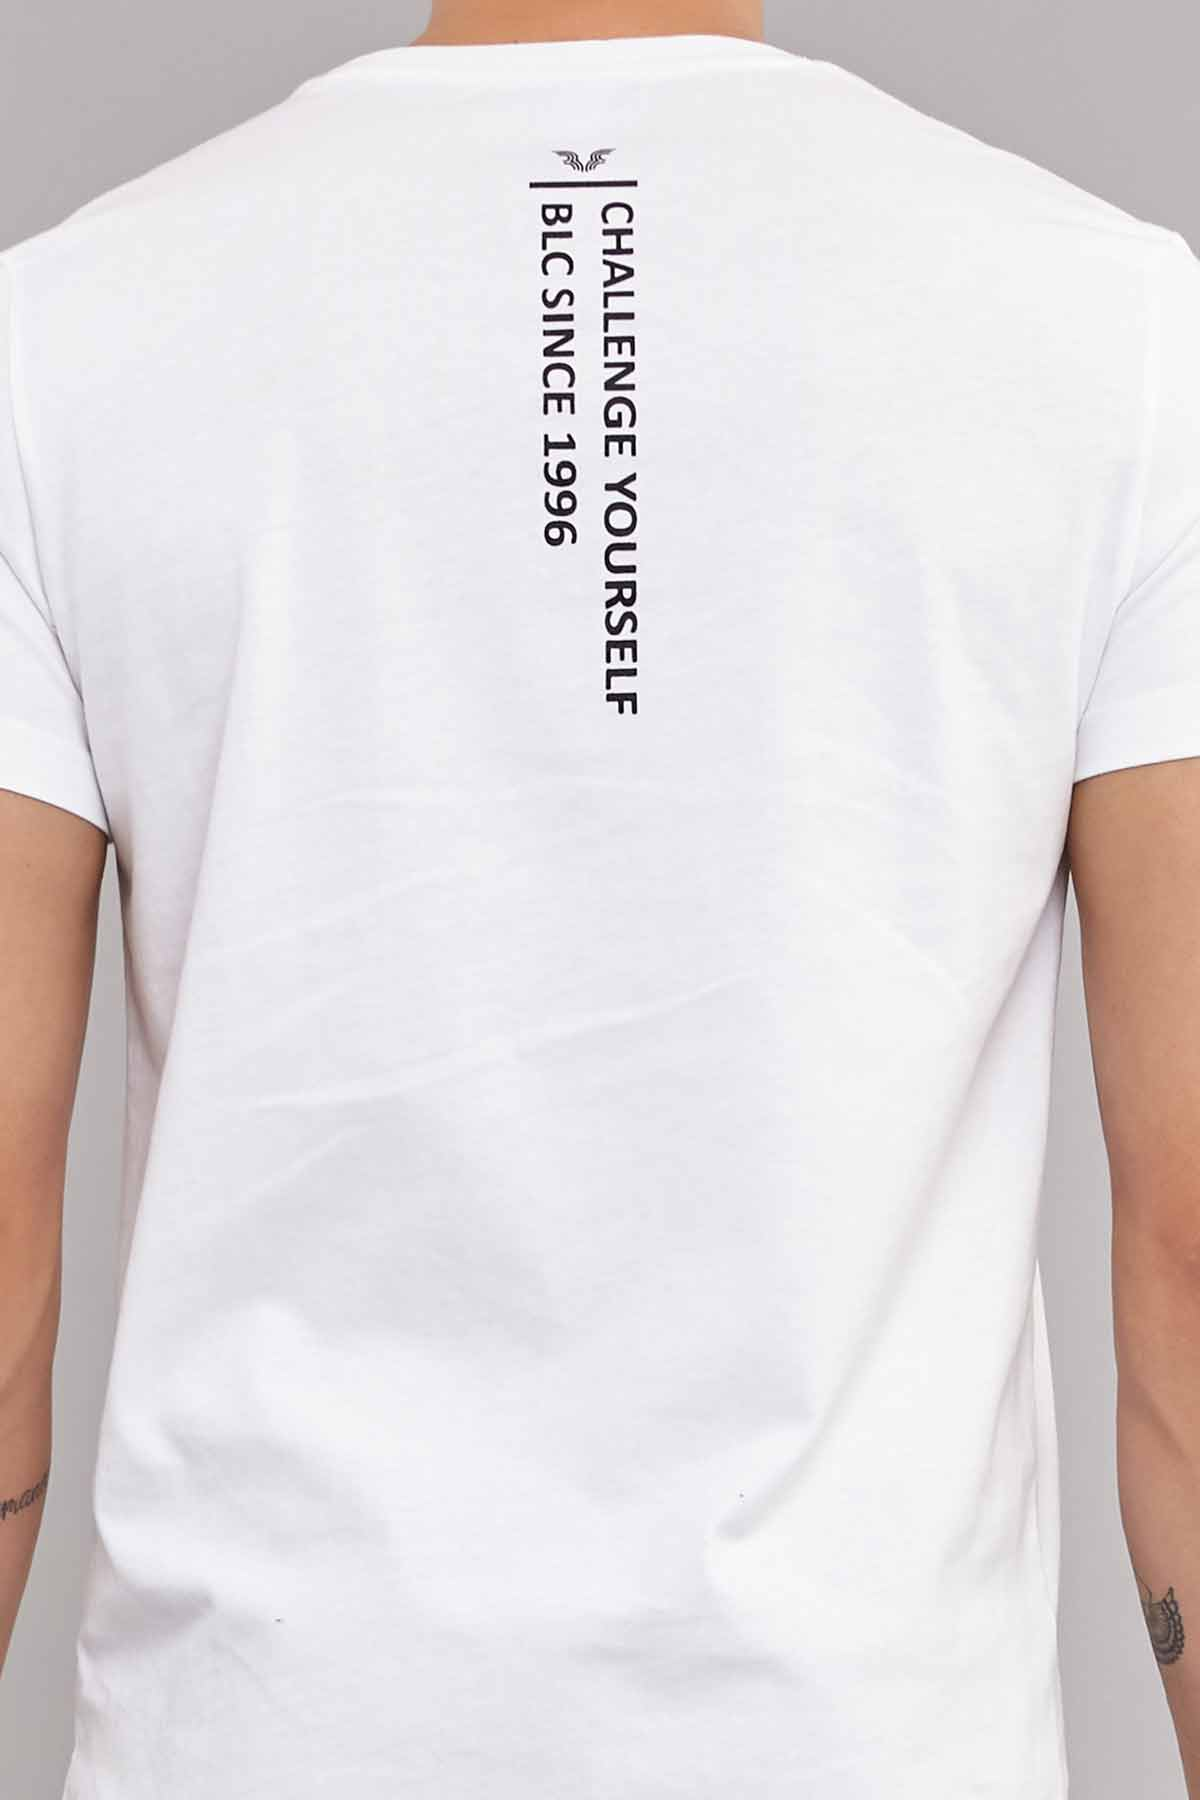 Bilcee Beyaz Pamuklu Erkek T-Shirt DW-2220 BİLCEE